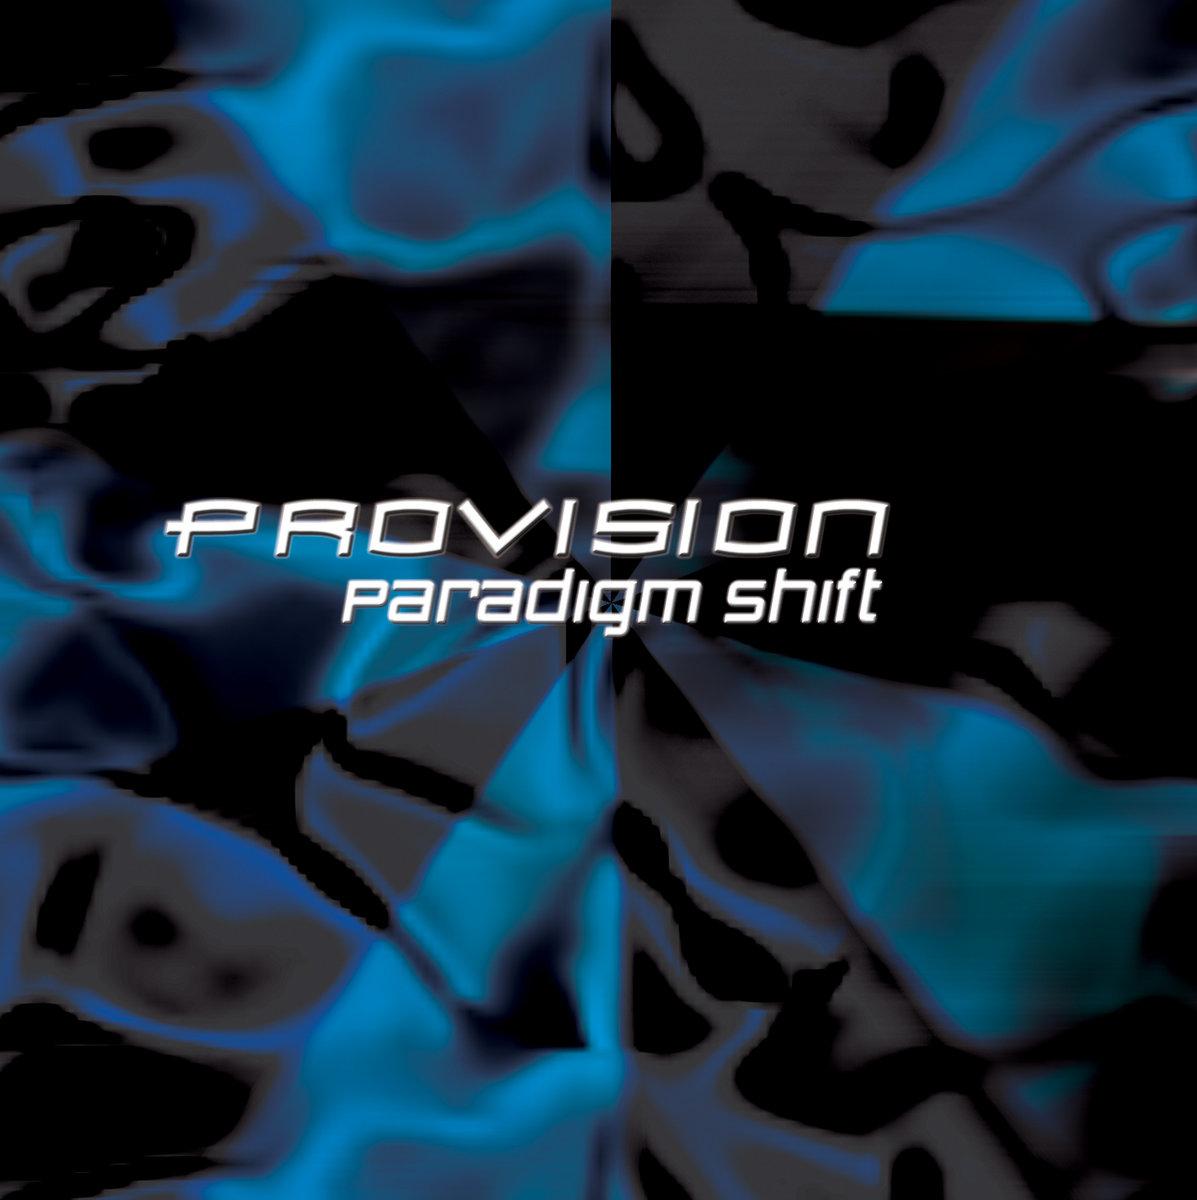 Paradigm shift definition